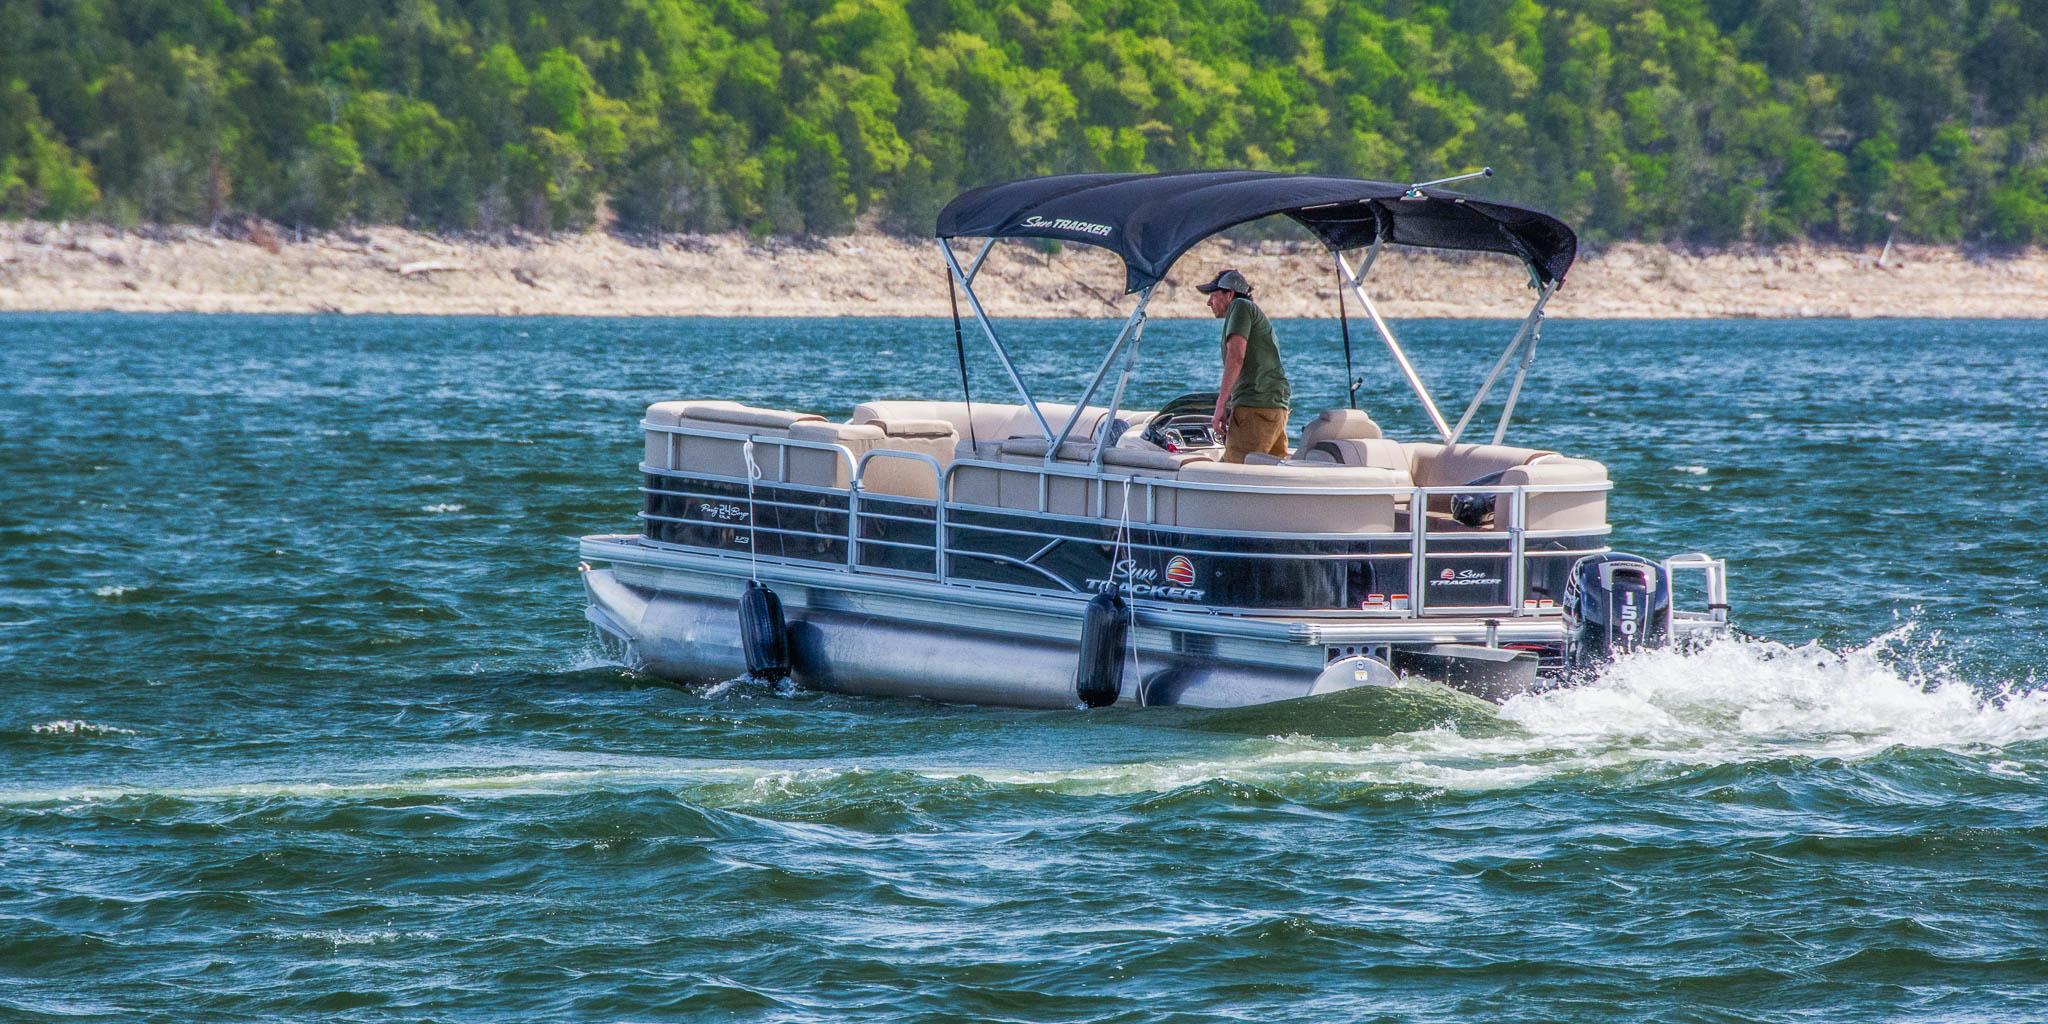 Theodosia rental boat 24 ft pontoon